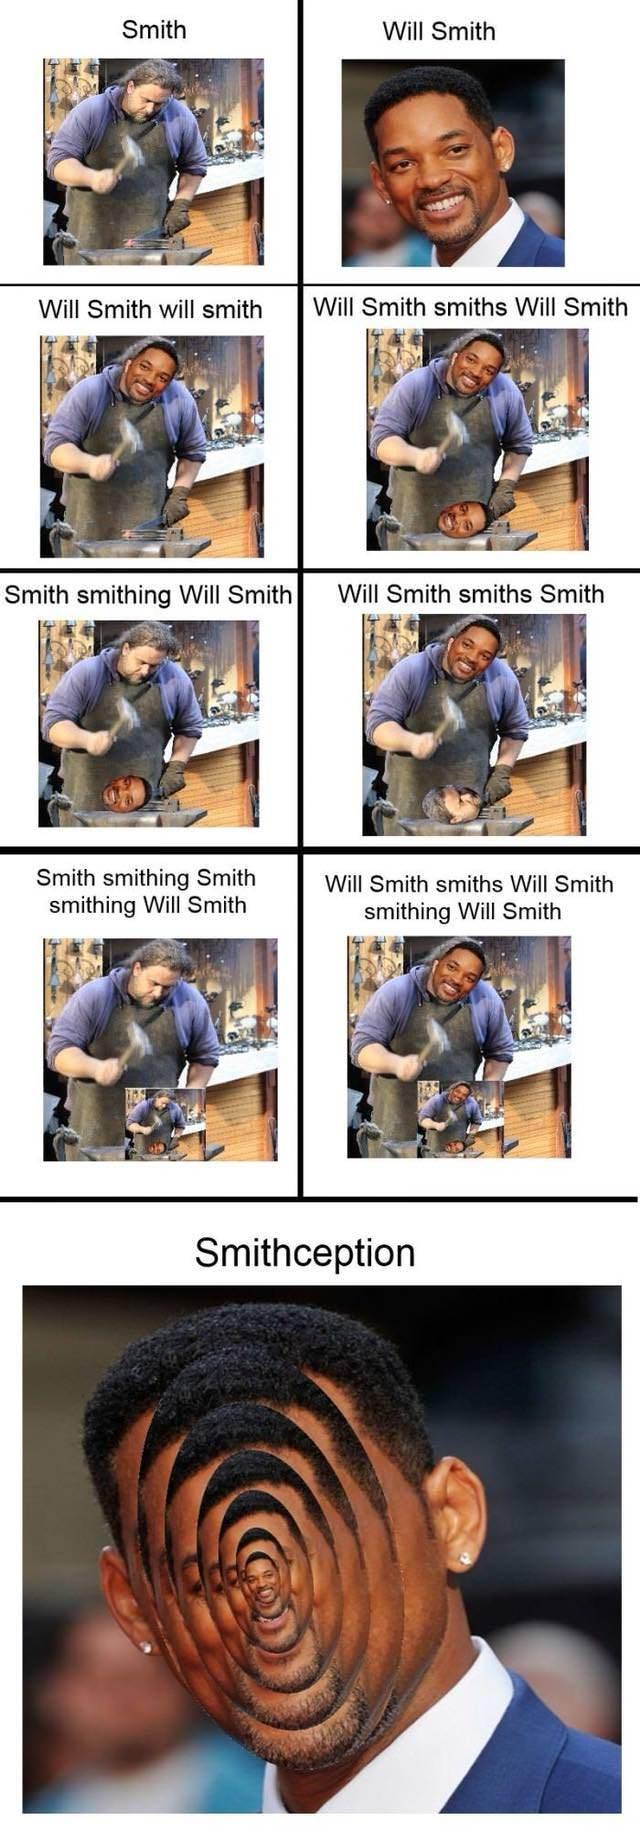 Smith - meme